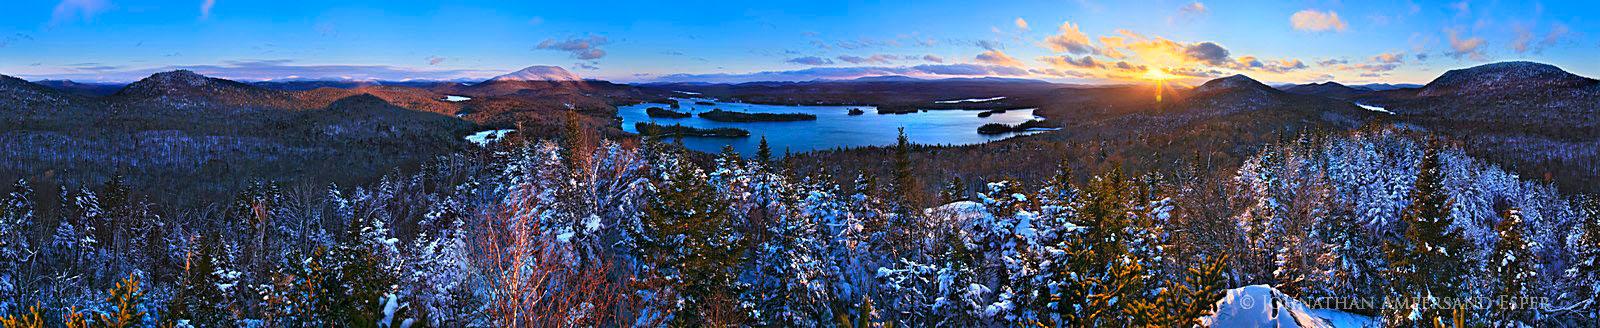 Blue Mountain Lake,winter,360 degree,panorama,Adirondack Park,Castle Rock,treetop,sunset,November,early, photo